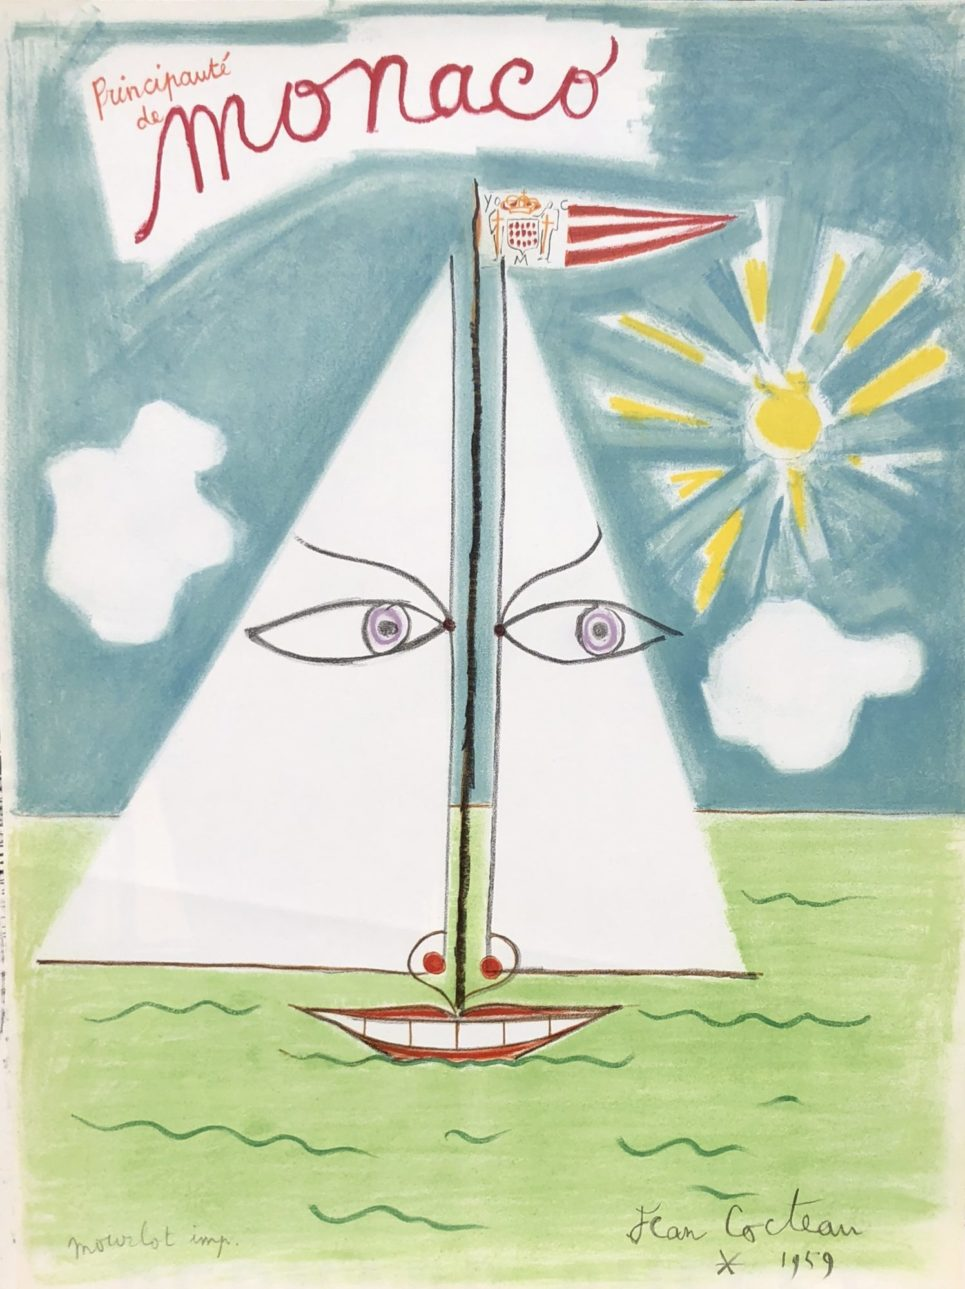 Monaco by Jean Cocteau